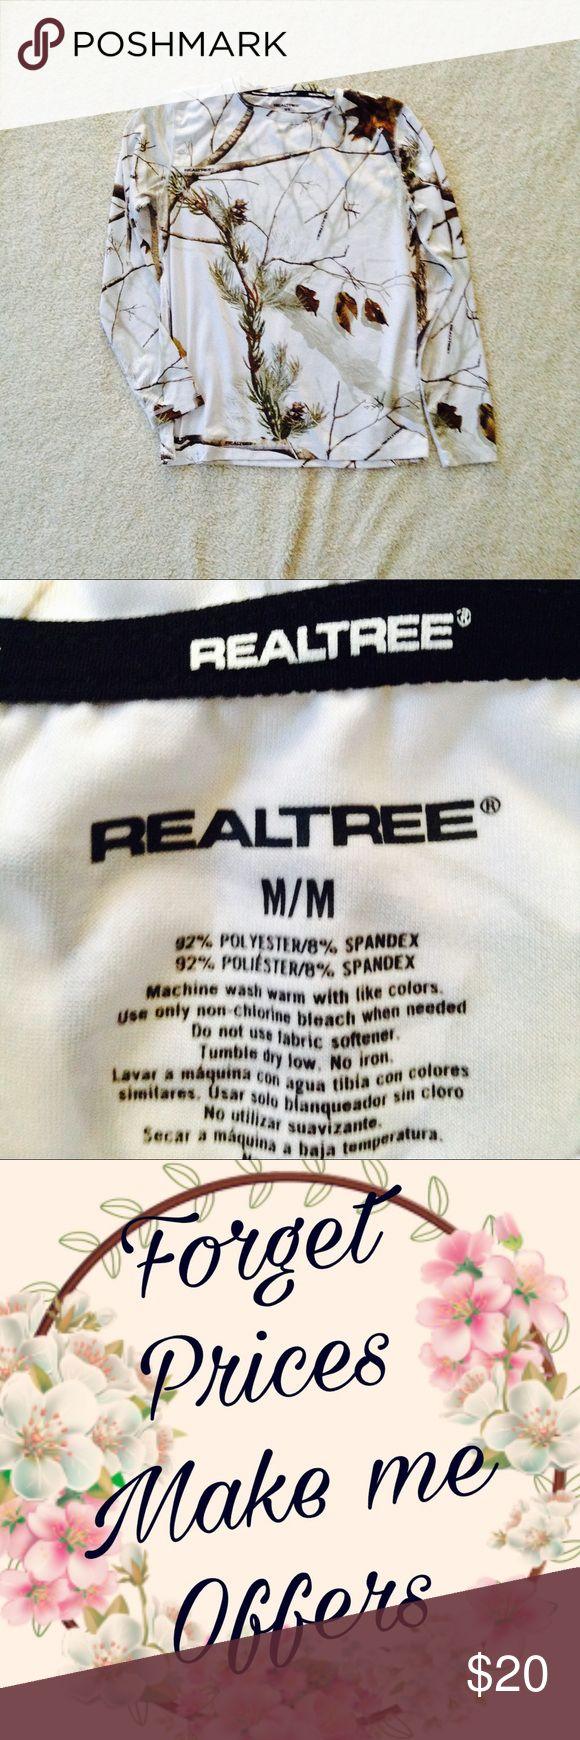 Real tree camouflage long sleeve shirt NWOT. Medium. M. 8-10. Realtree Tops Tees - Long Sleeve